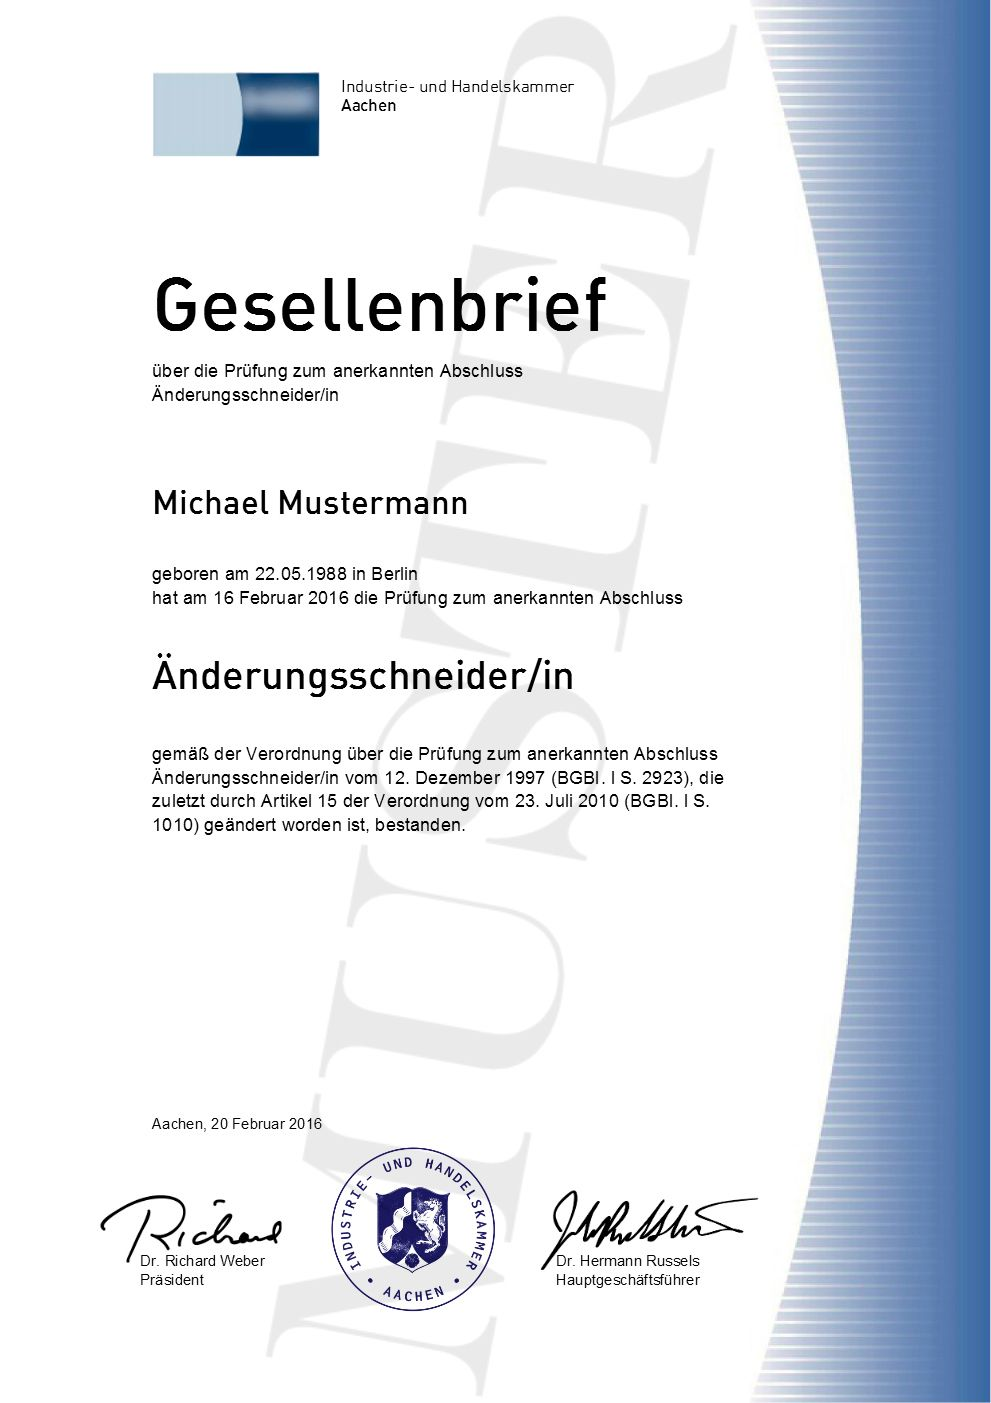 Beste Frei Druckbare Diplomvorlagen Fotos - Entry Level Resume ...